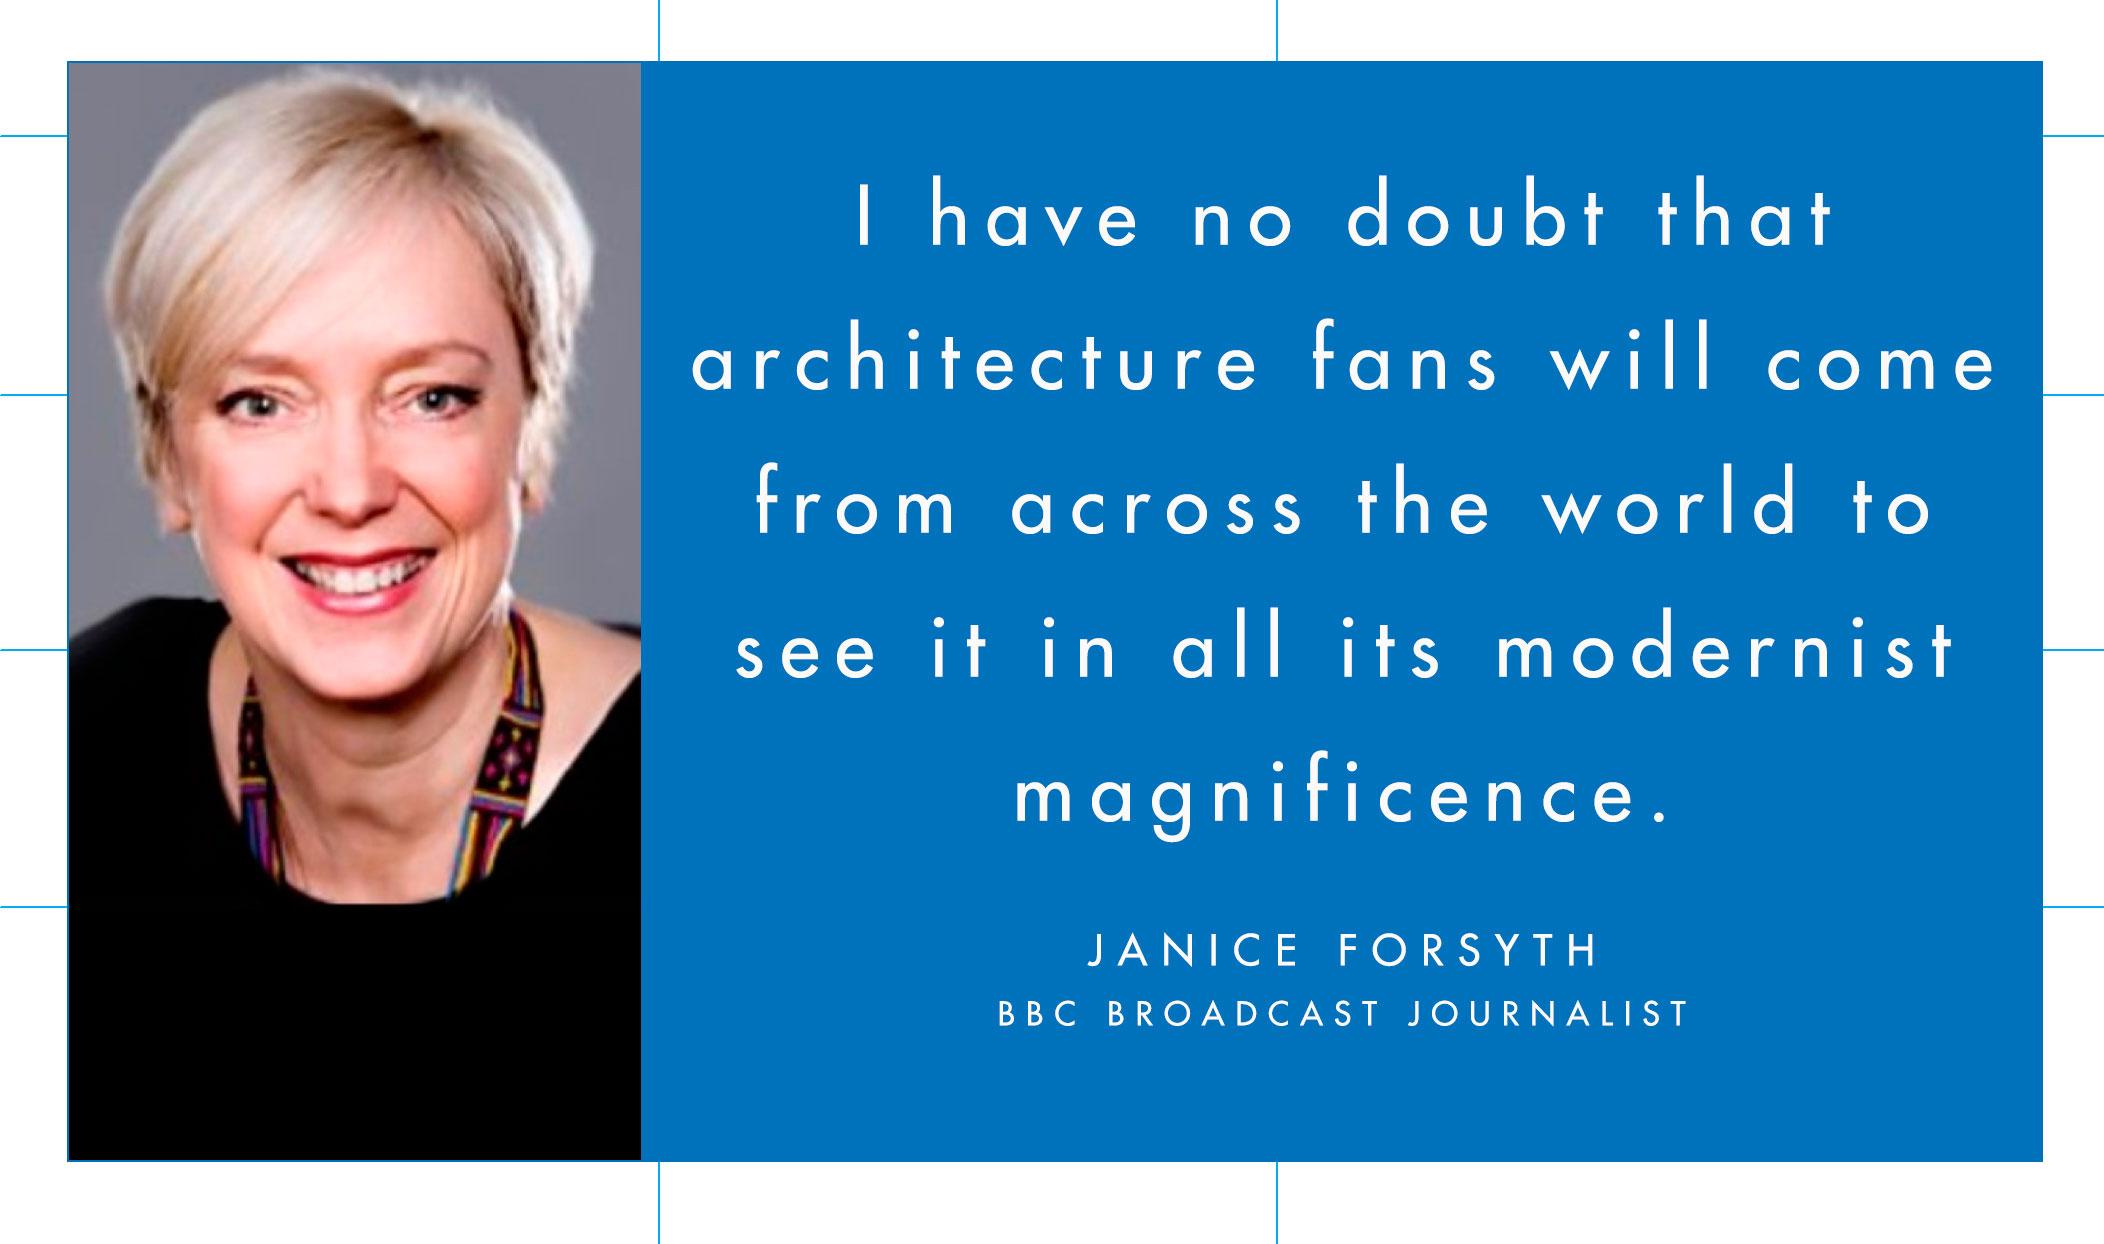 JANICE-FOSYTH-3